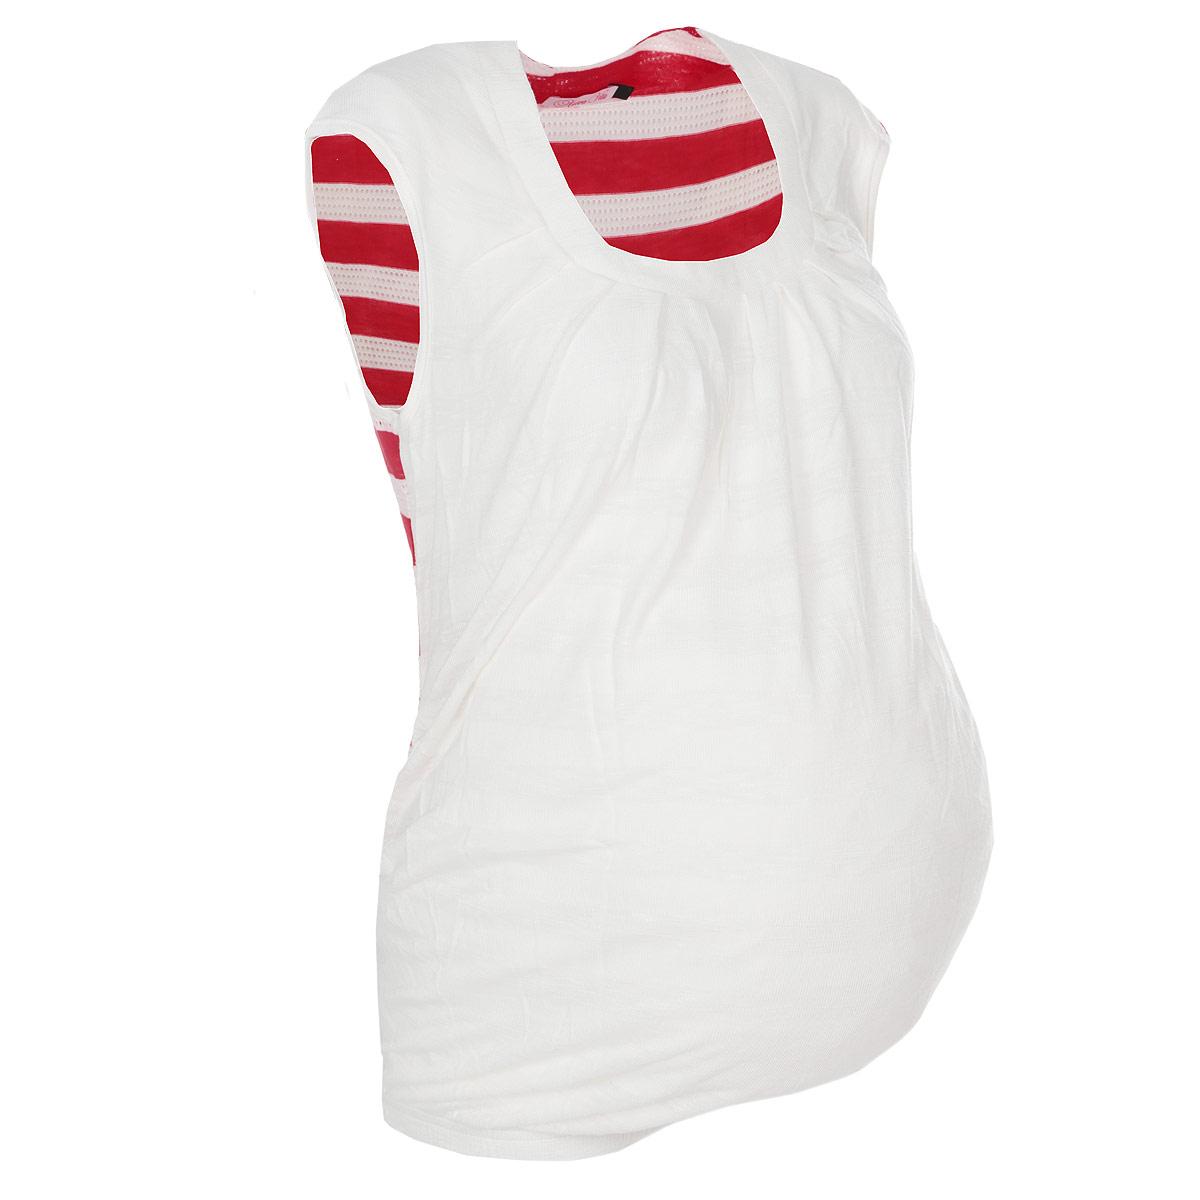 Футболка для беременных Nuova Vita, цвет: белый, красный. 1347.1. Размер 44 блузки nuova vita блуза 2 в 1 для беременных и для кормления